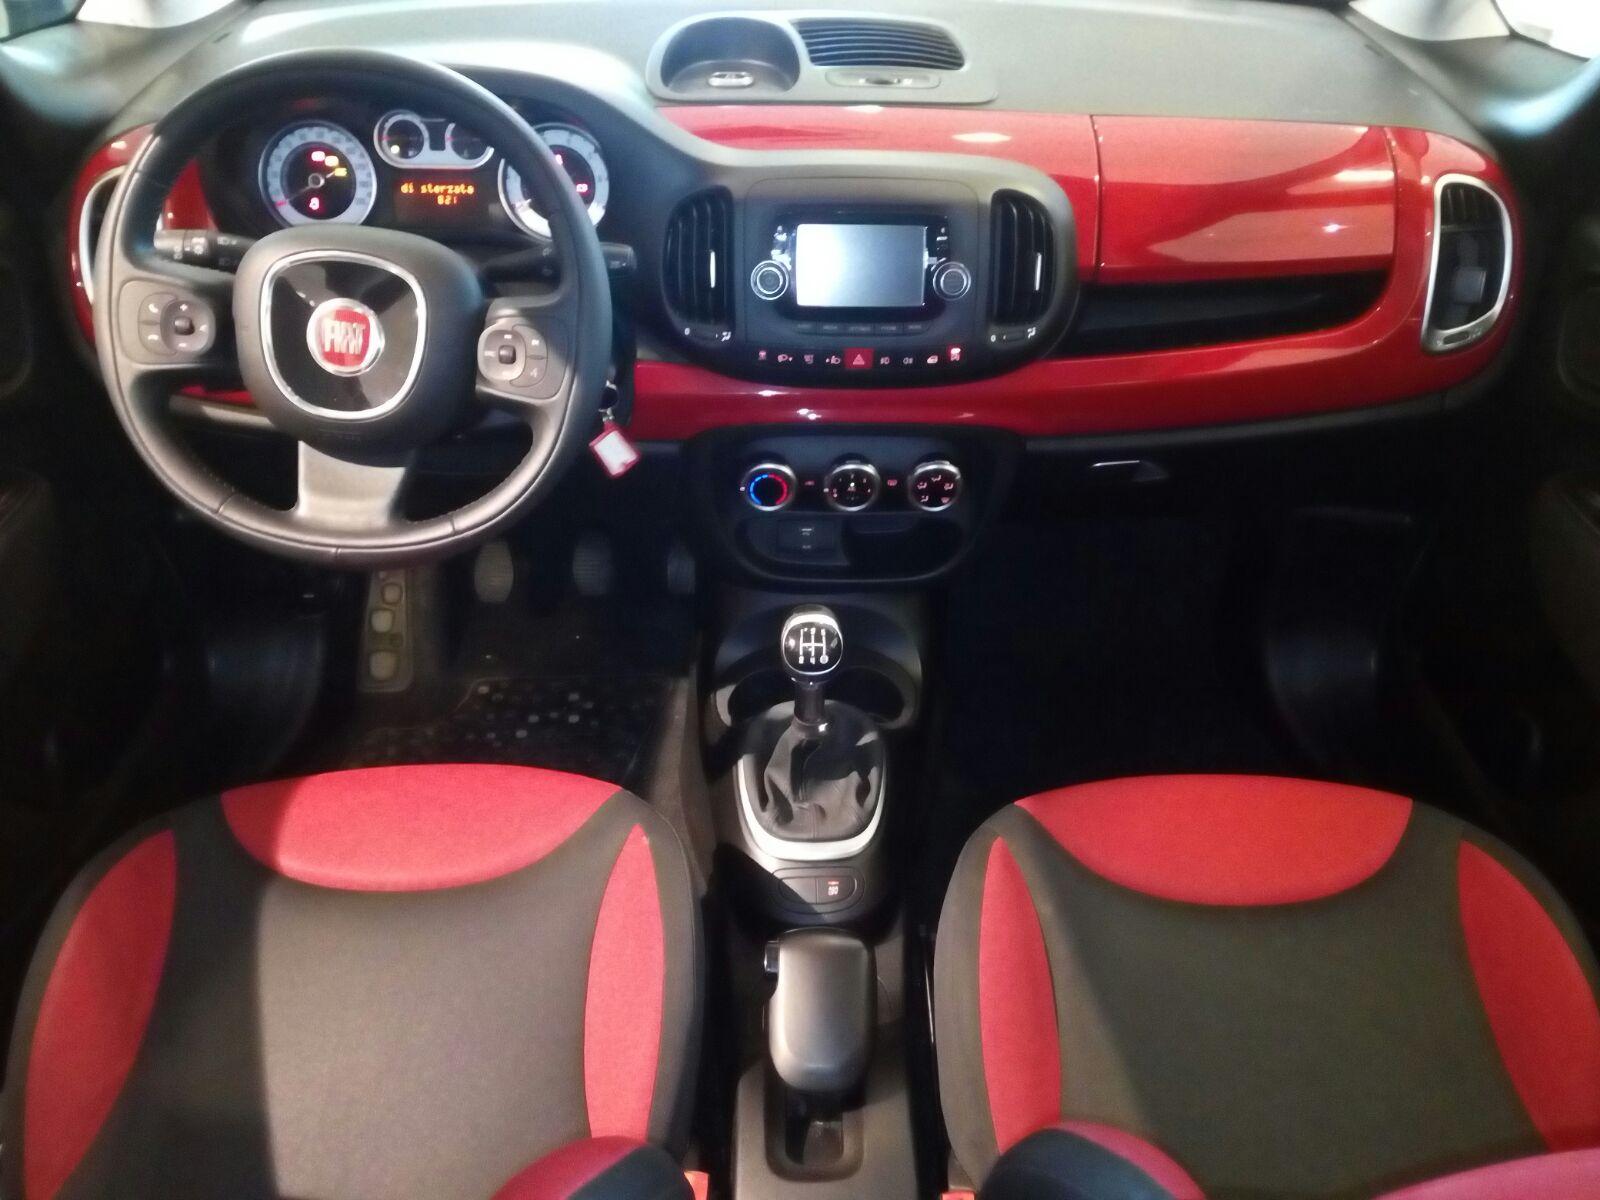 Fiat 500 L 1.3 Multijet 95 cv (6)